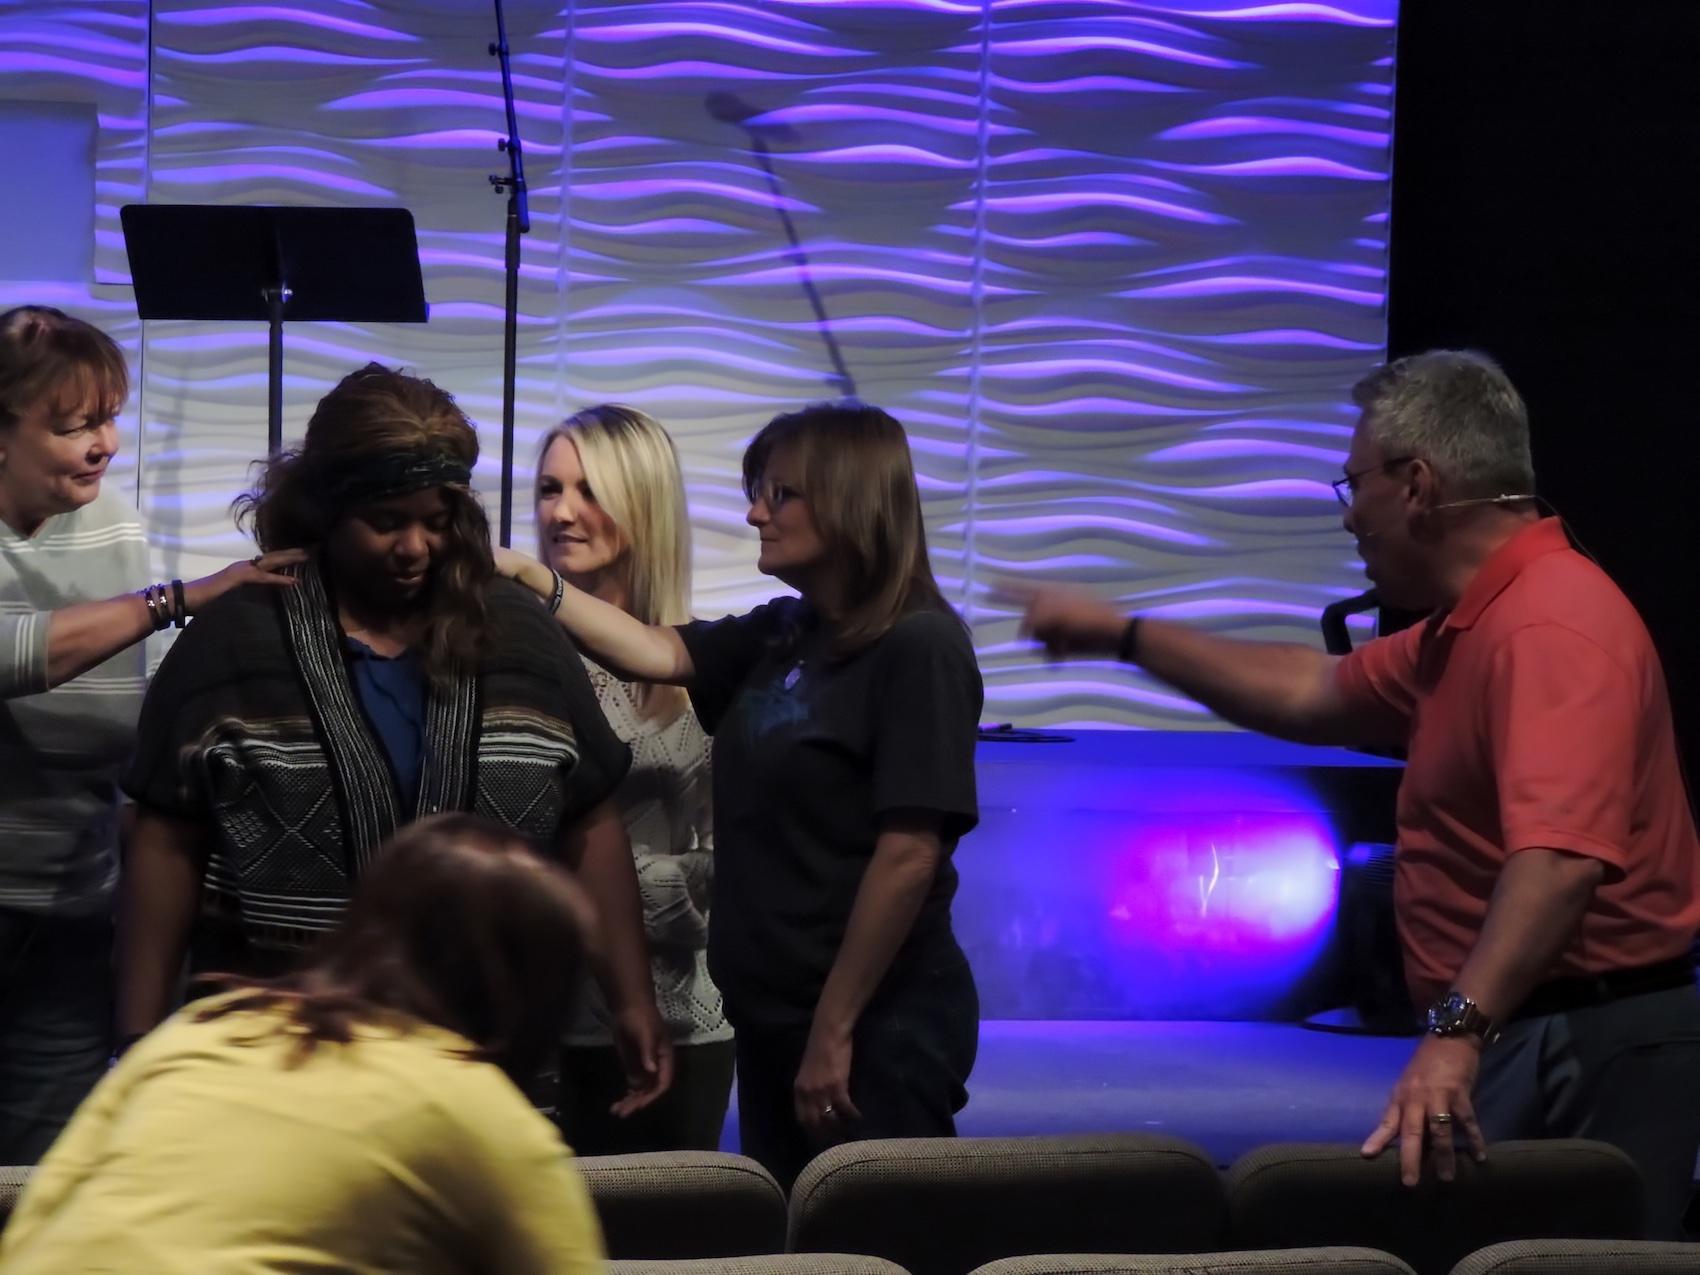 authority-evanglelism-healing-lady